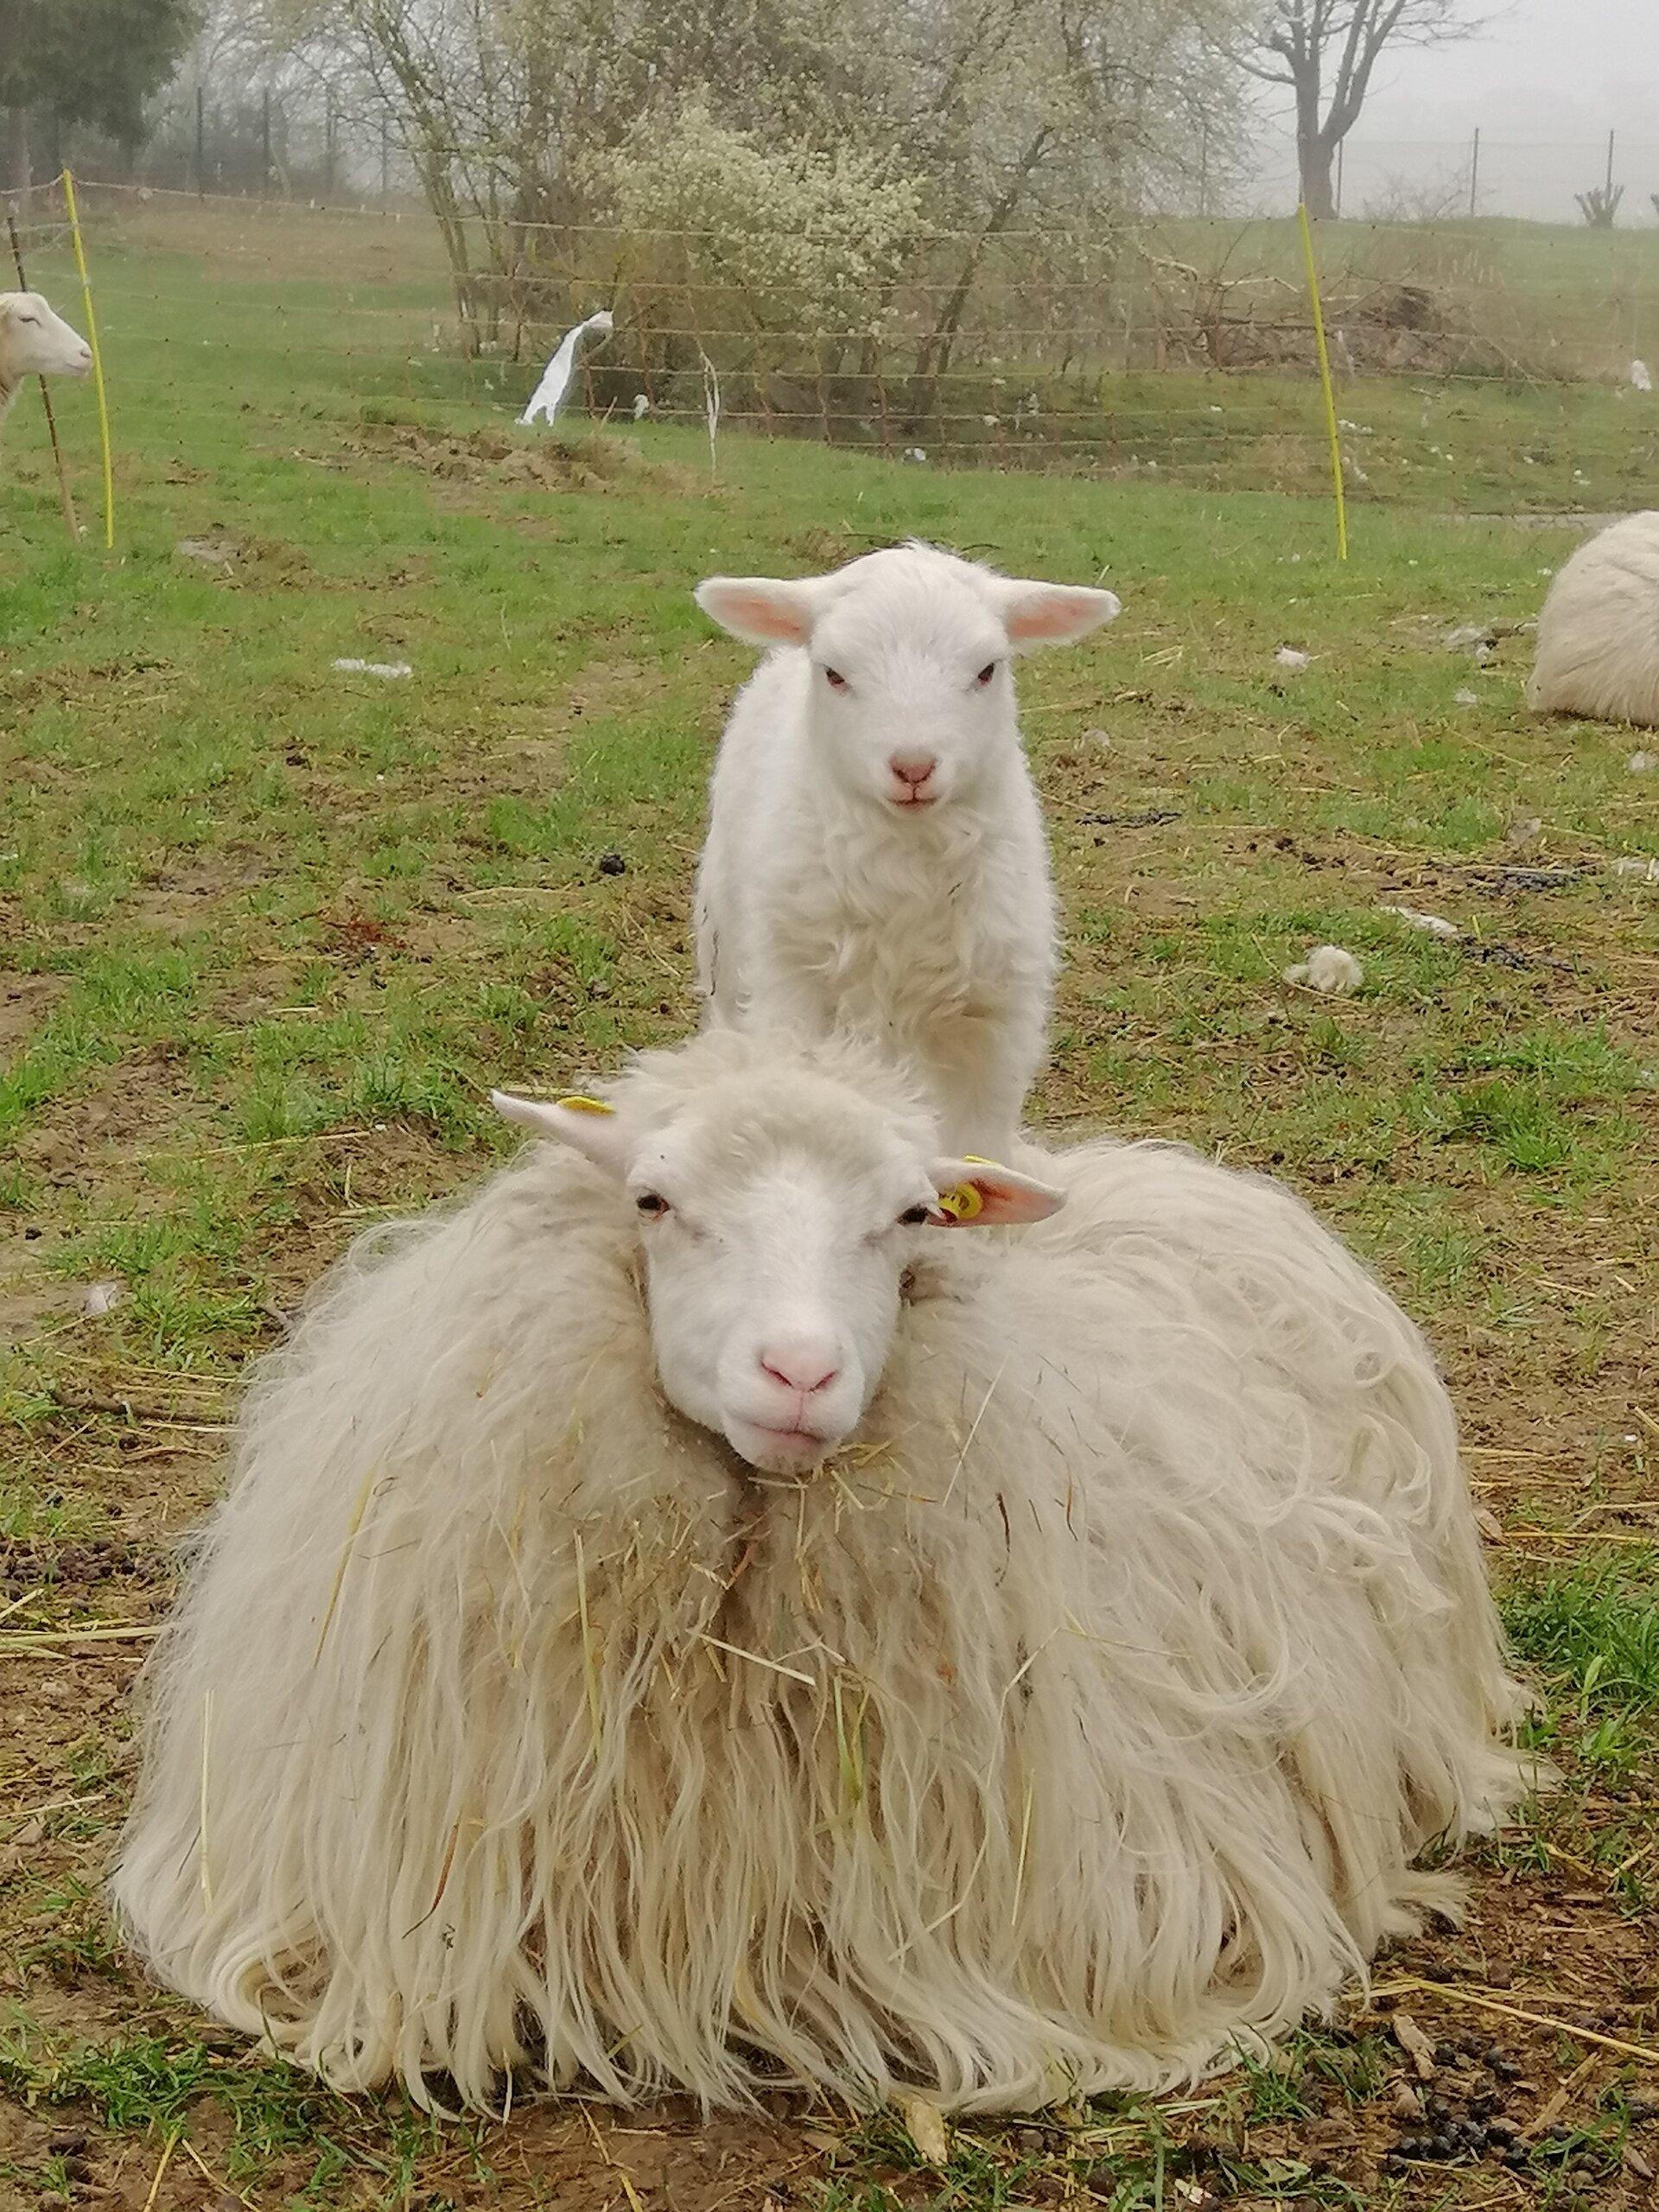 Moorschnucke mit Lamm (©J. Kroll)